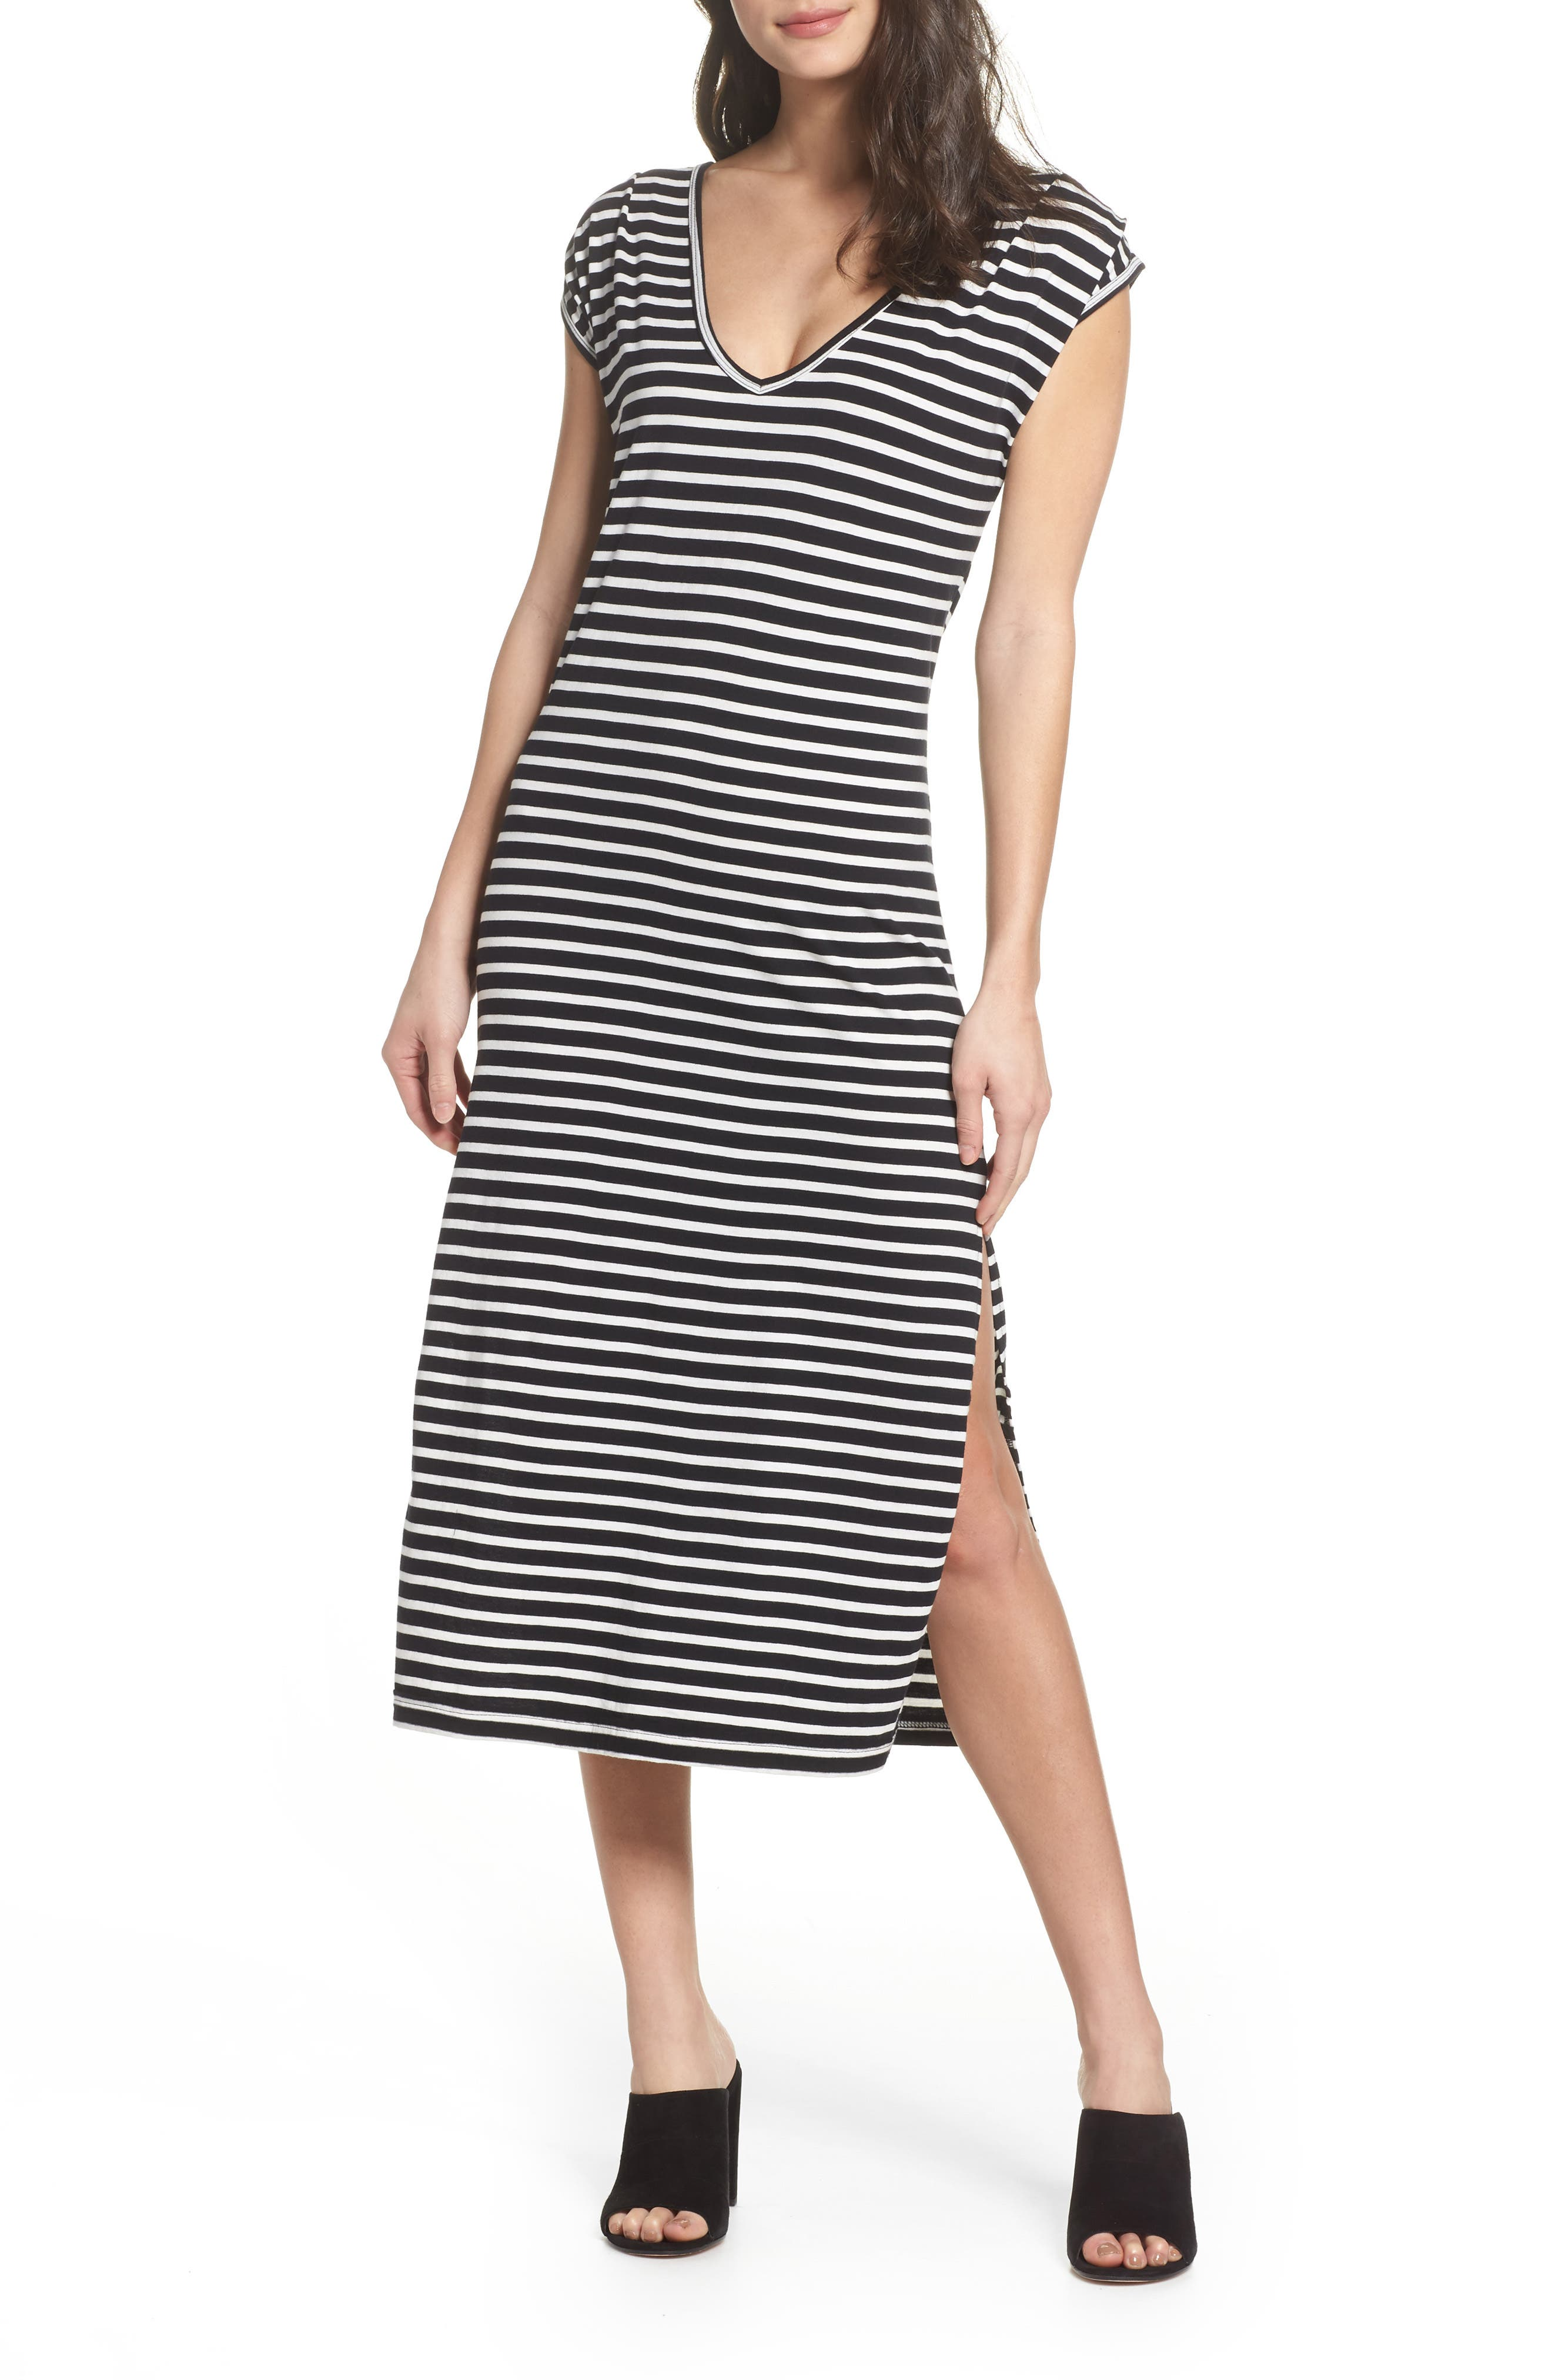 Solana Stripe Knit Midi Dress,                         Main,                         color, Black White Stripe